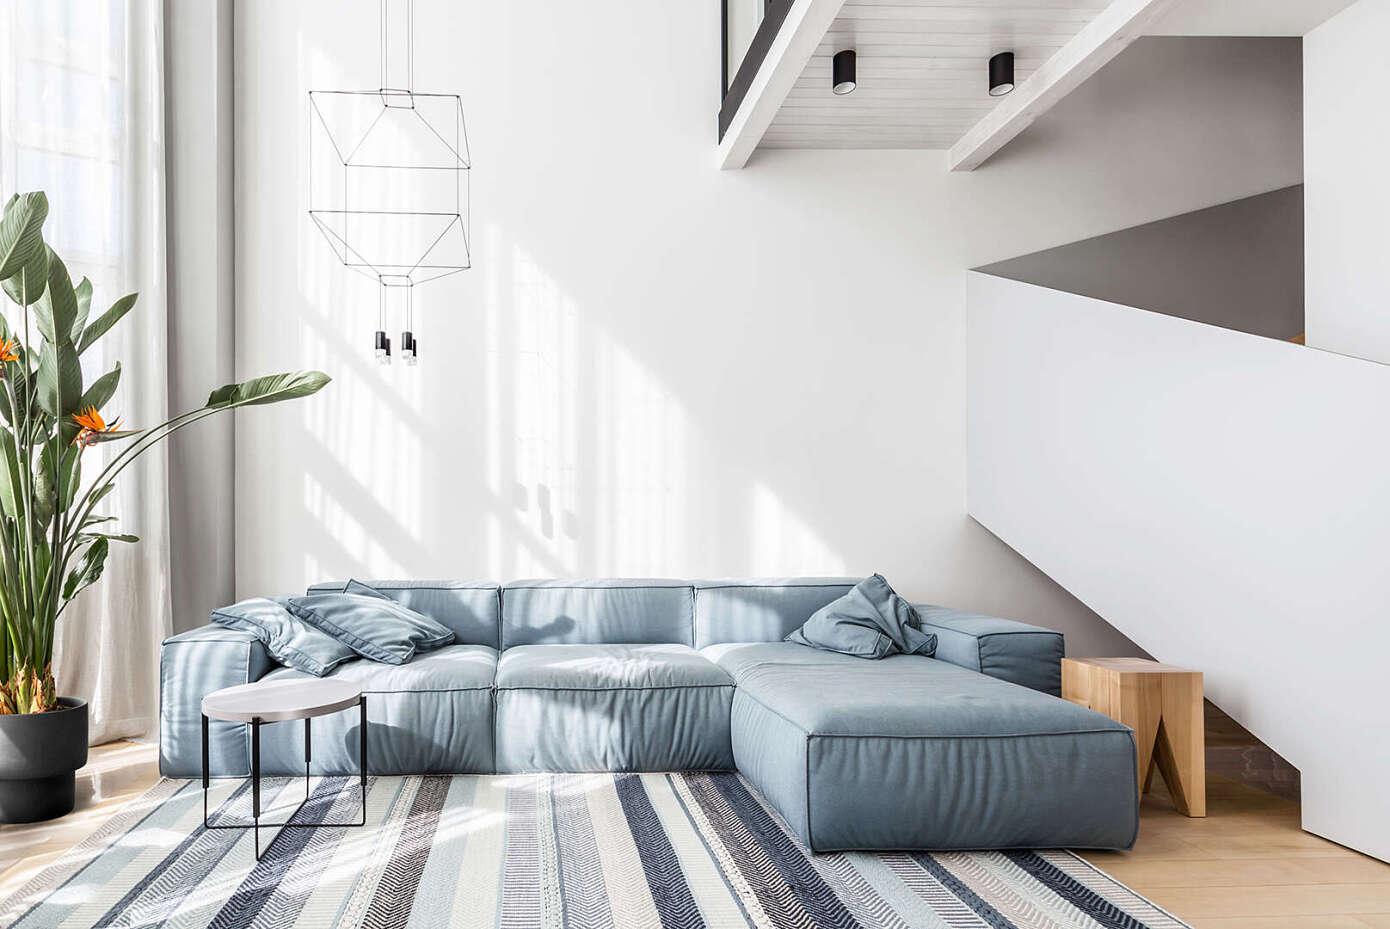 Sonyachna Brama by Lugerin Architects